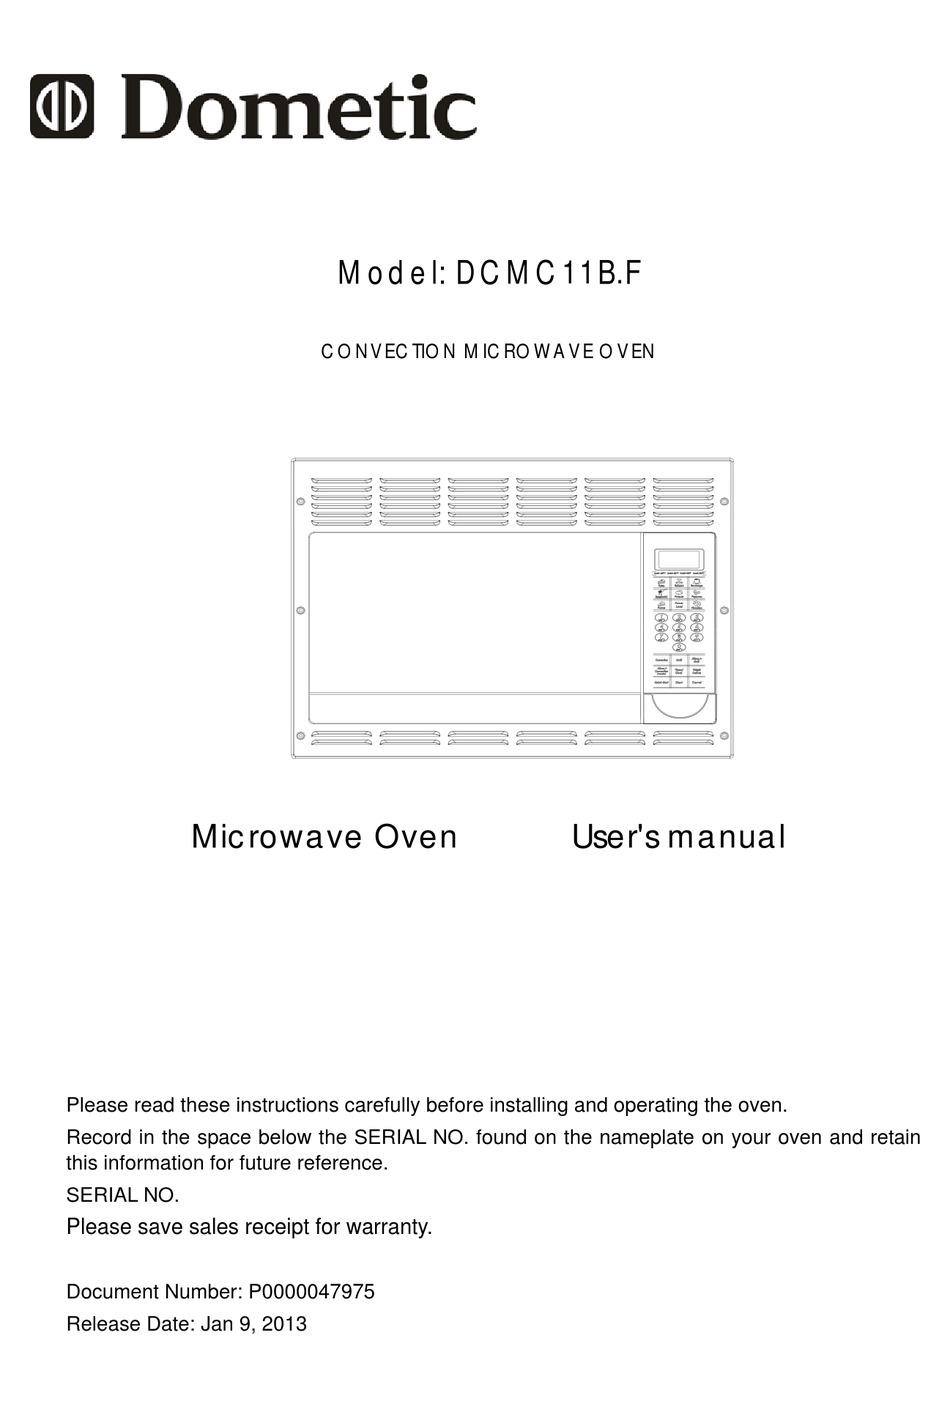 dometic dcmc11b f user manual pdf